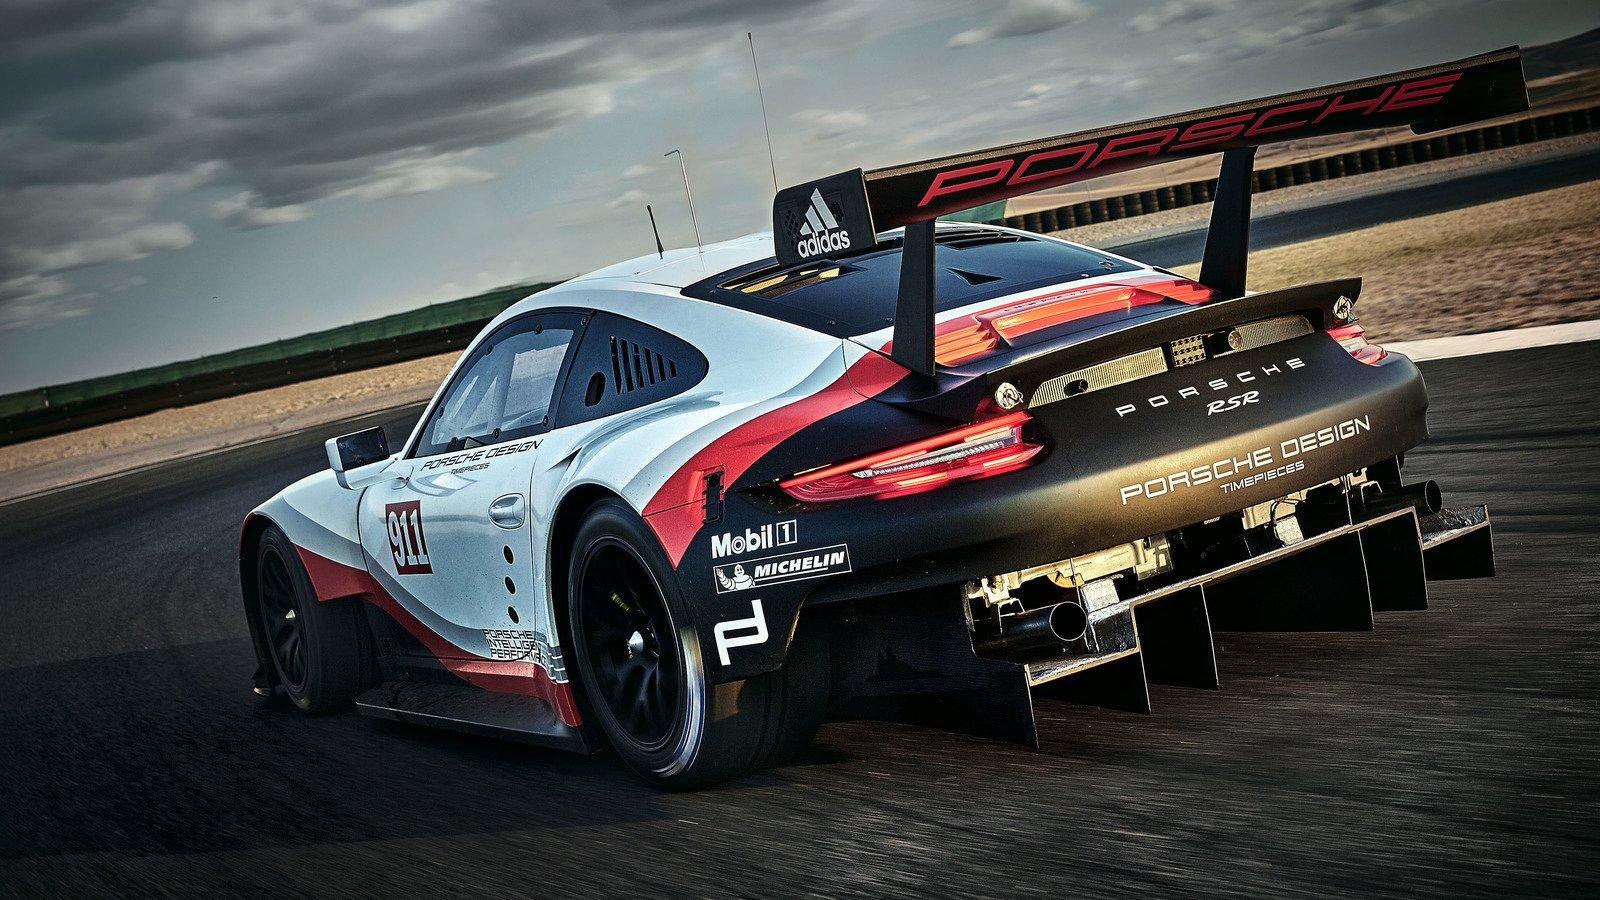 2017 porsche 911 rsr race car is now mid engined image 580799. Black Bedroom Furniture Sets. Home Design Ideas